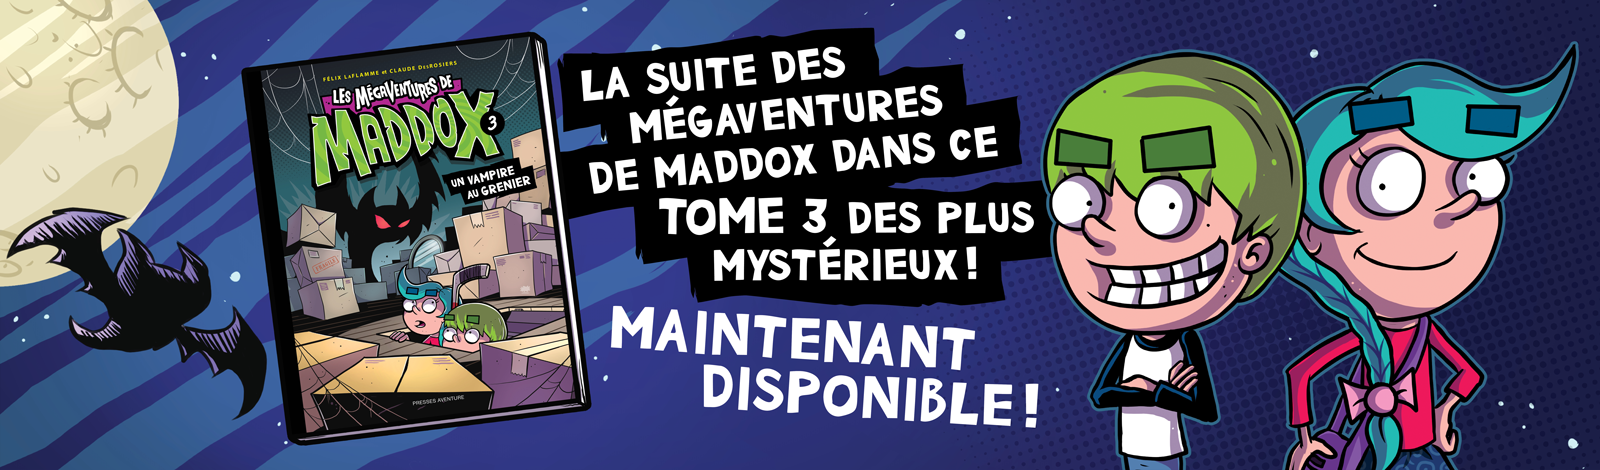 Maddox 3